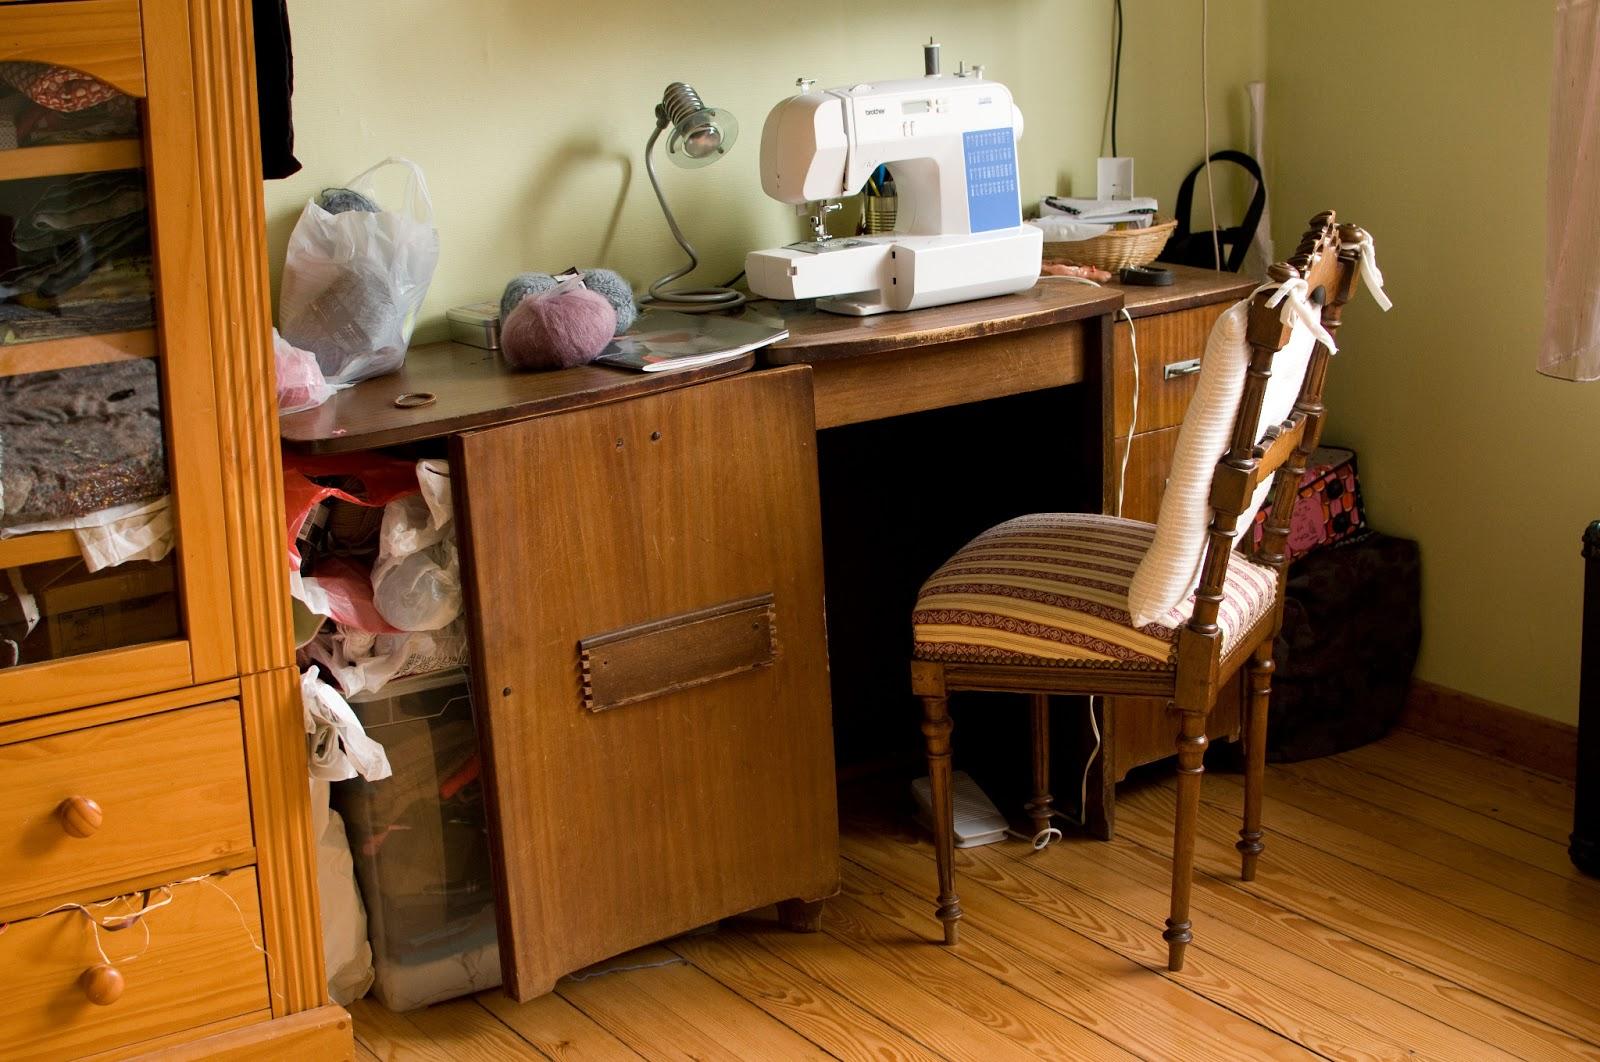 meuble atelier couture meuble atelier couture meuble en situation meuble atelier couture. Black Bedroom Furniture Sets. Home Design Ideas